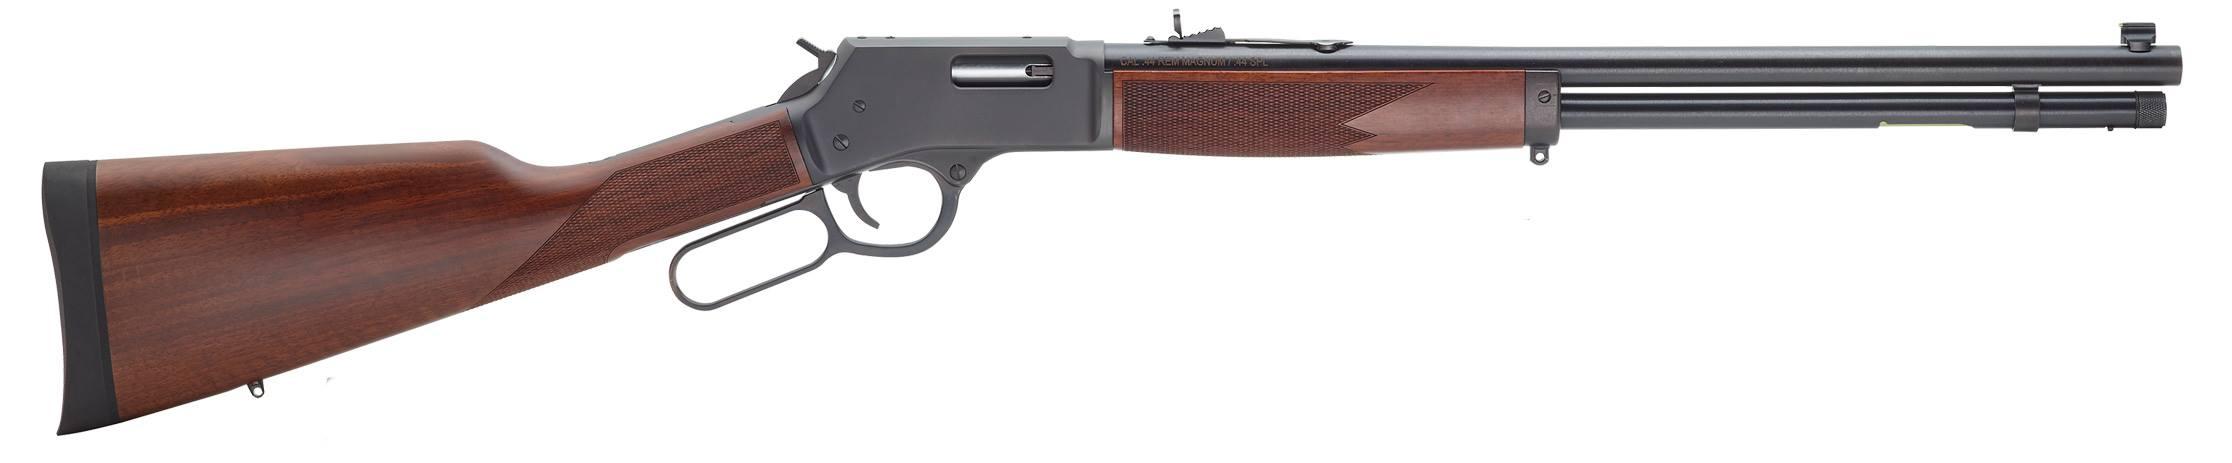 Henry Repeating Arms Big Boy Steel 41 Magnum